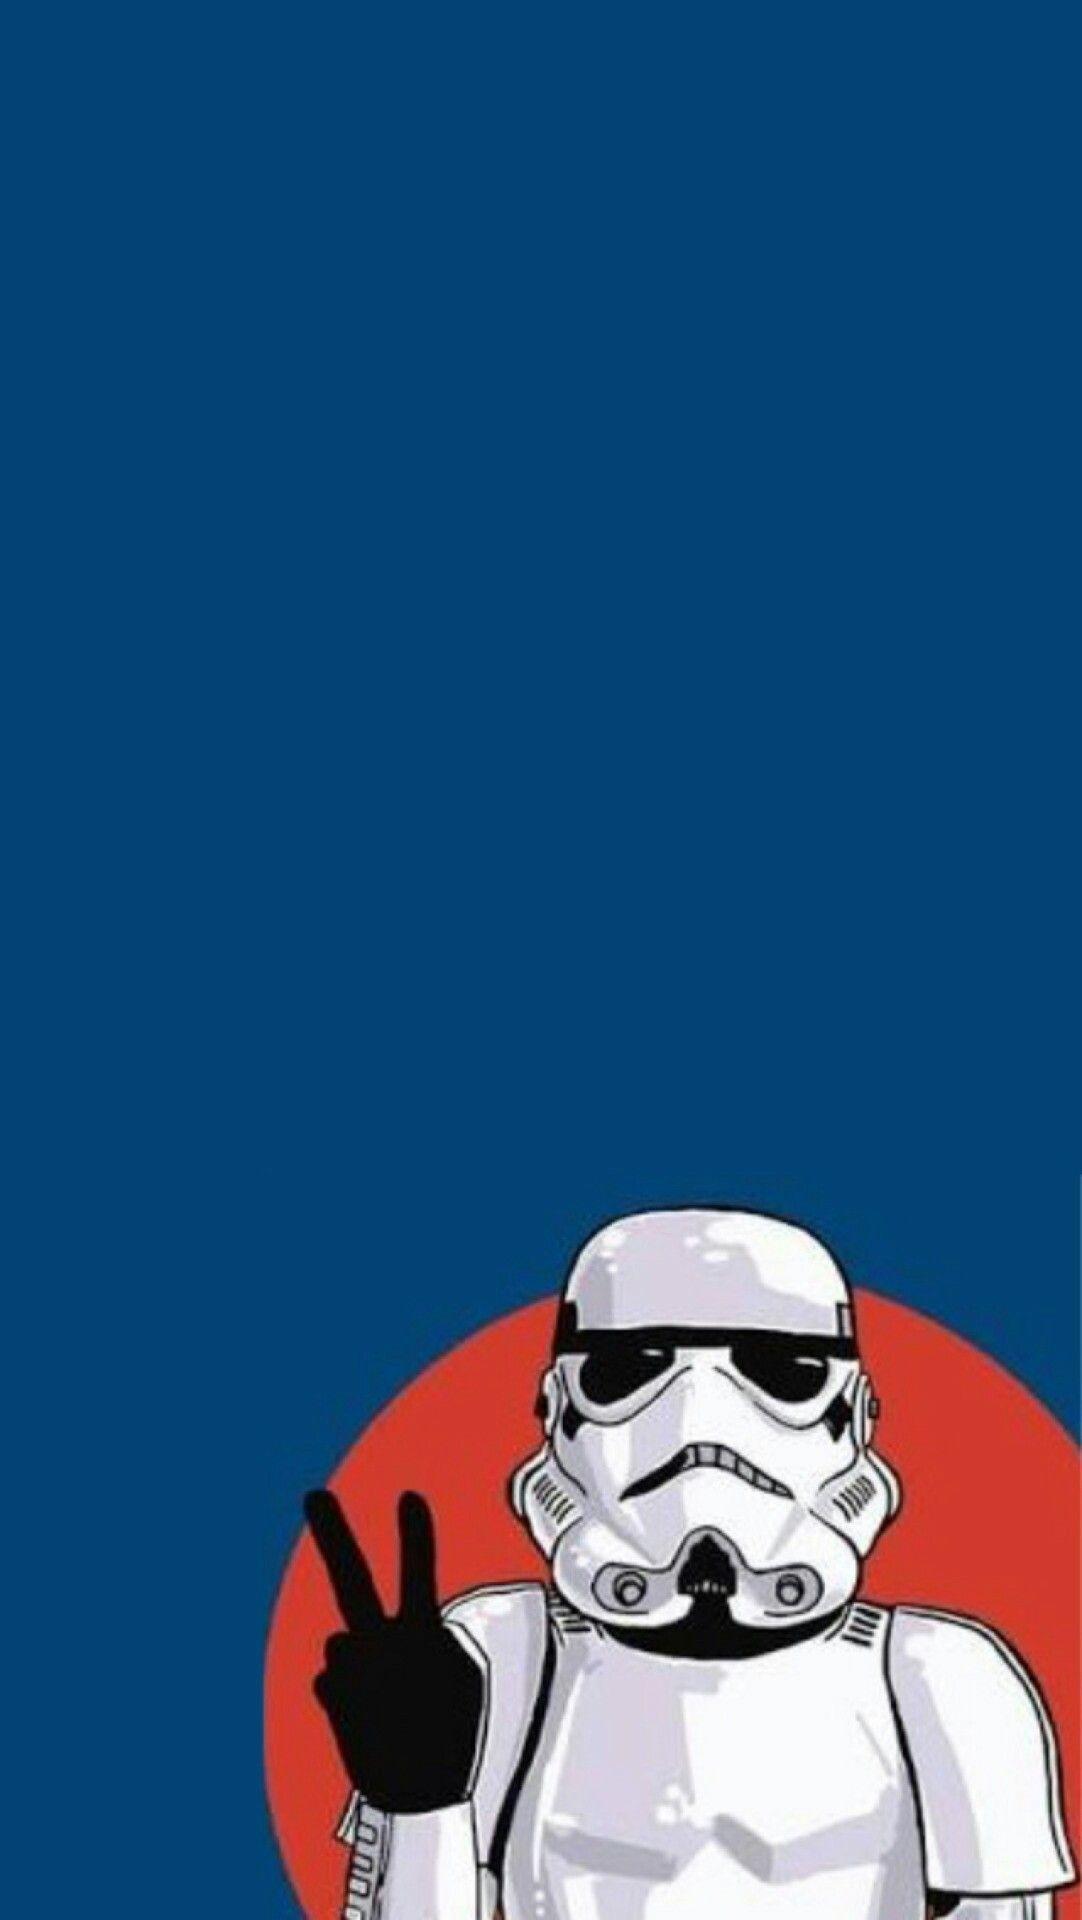 Star Wars Lockscreen Starwarswallpaper En 2020 Fondos De Comic